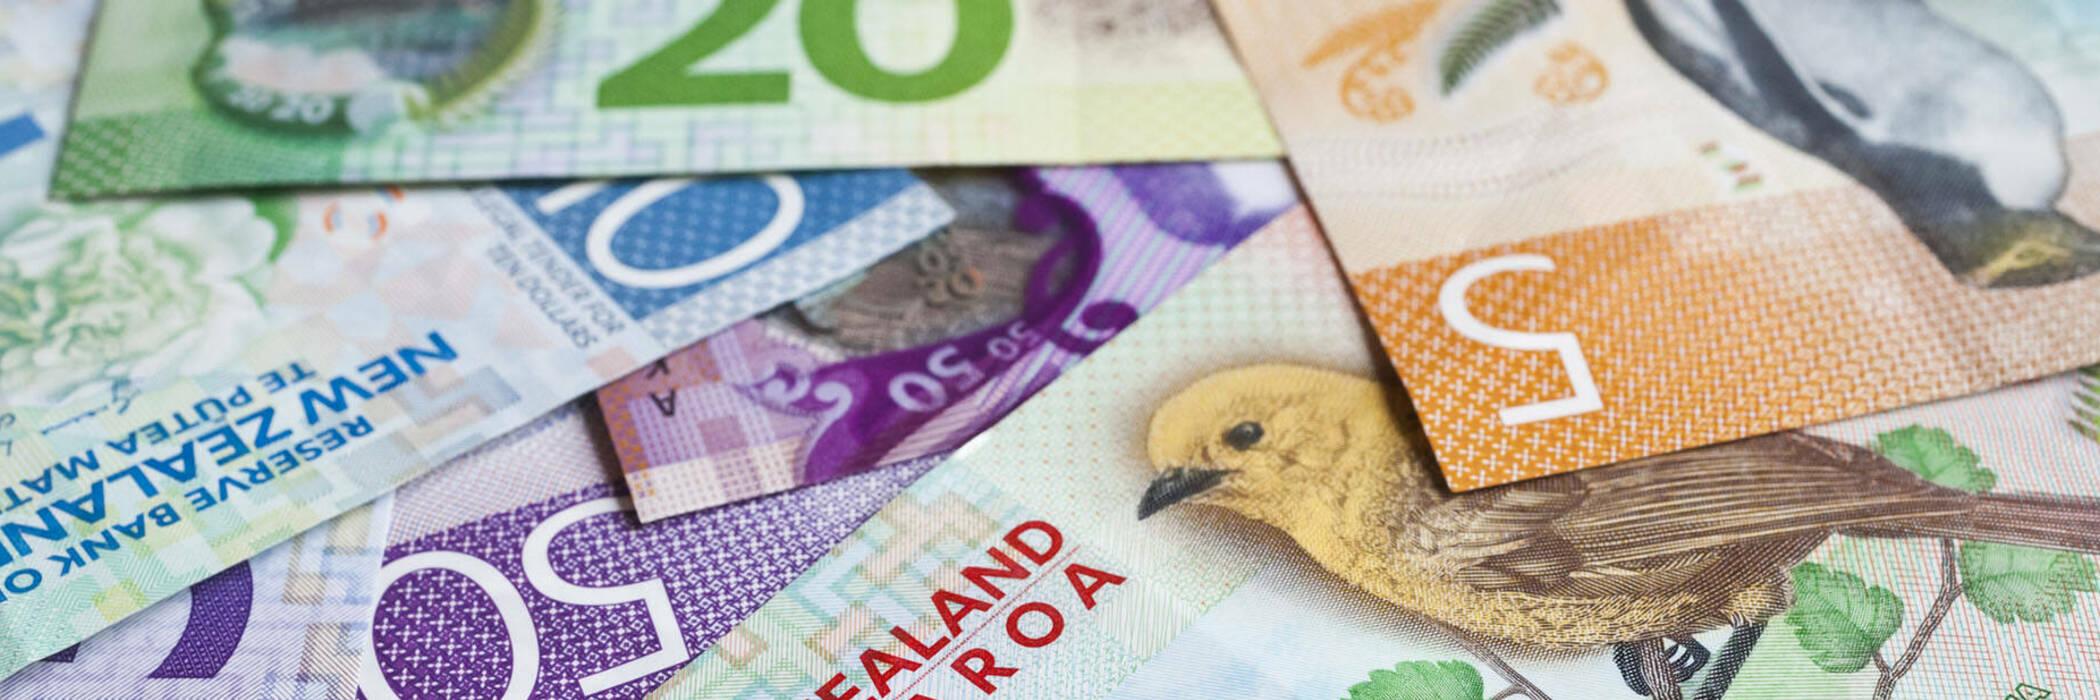 New Zealand bank notes